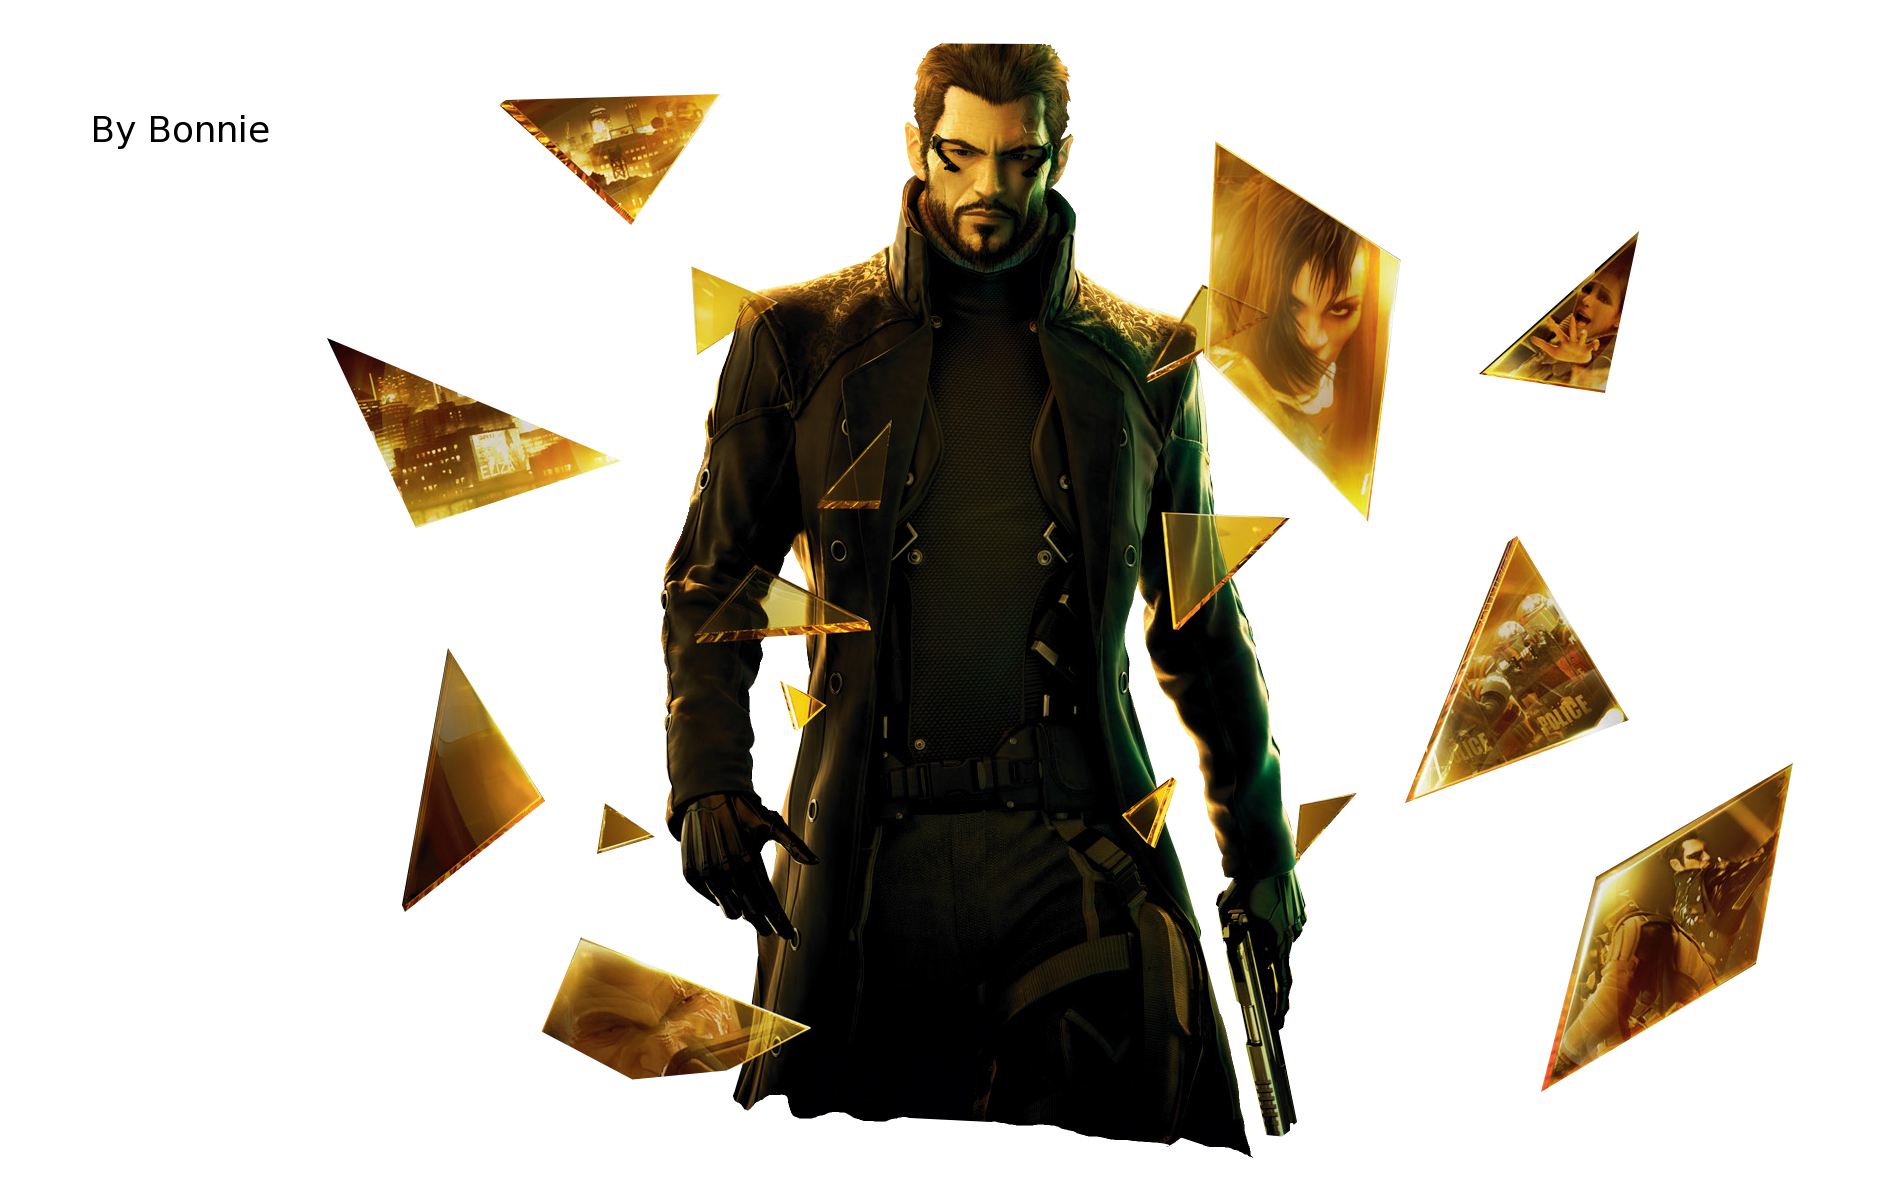 Deus Ex Png Hd PNG Image - Deus Ex PNG